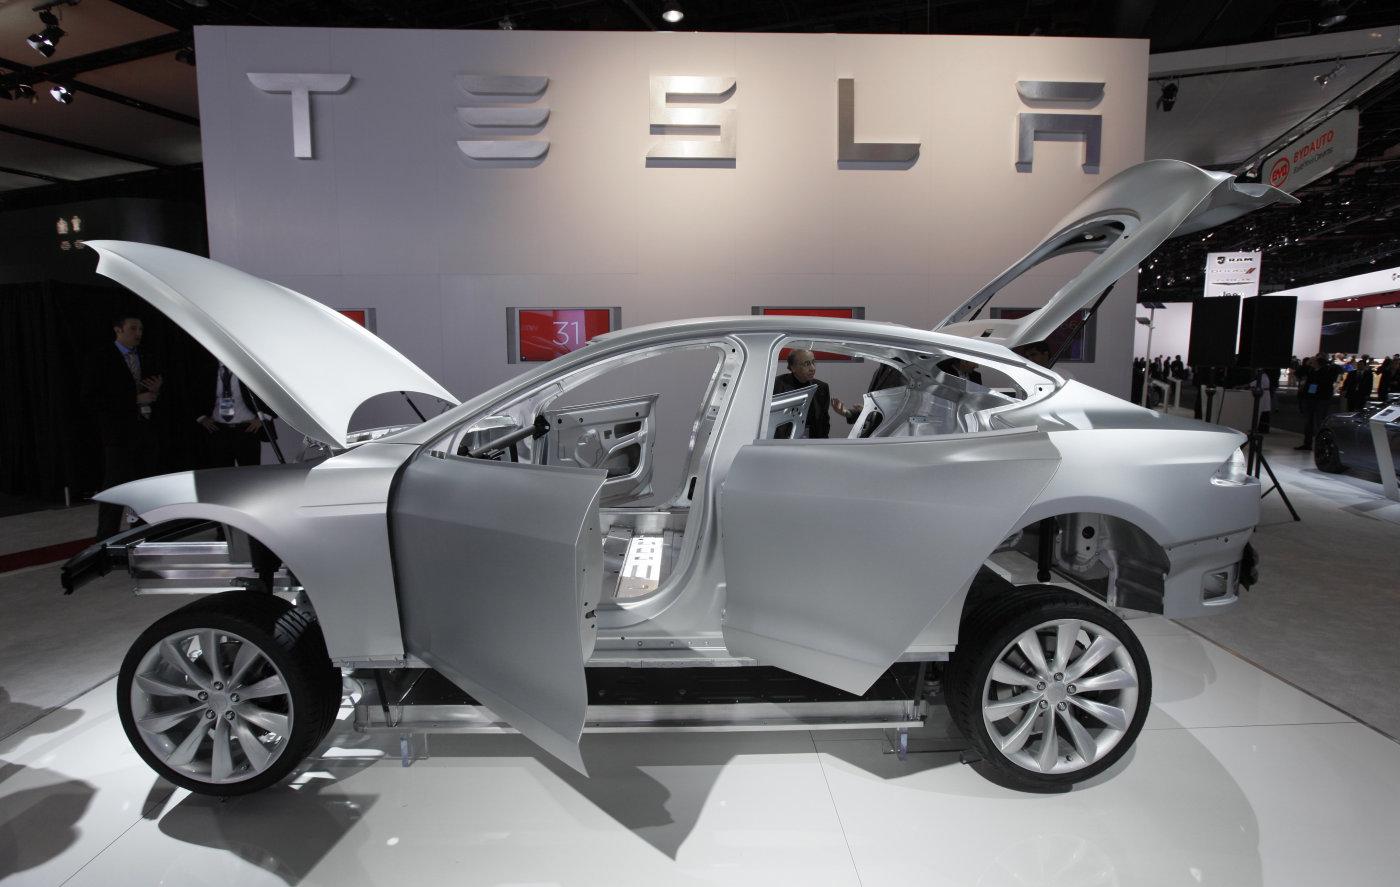 Tesla enthüllt Model 3 für 35.000 Dollar am 31. März (UPDATE)